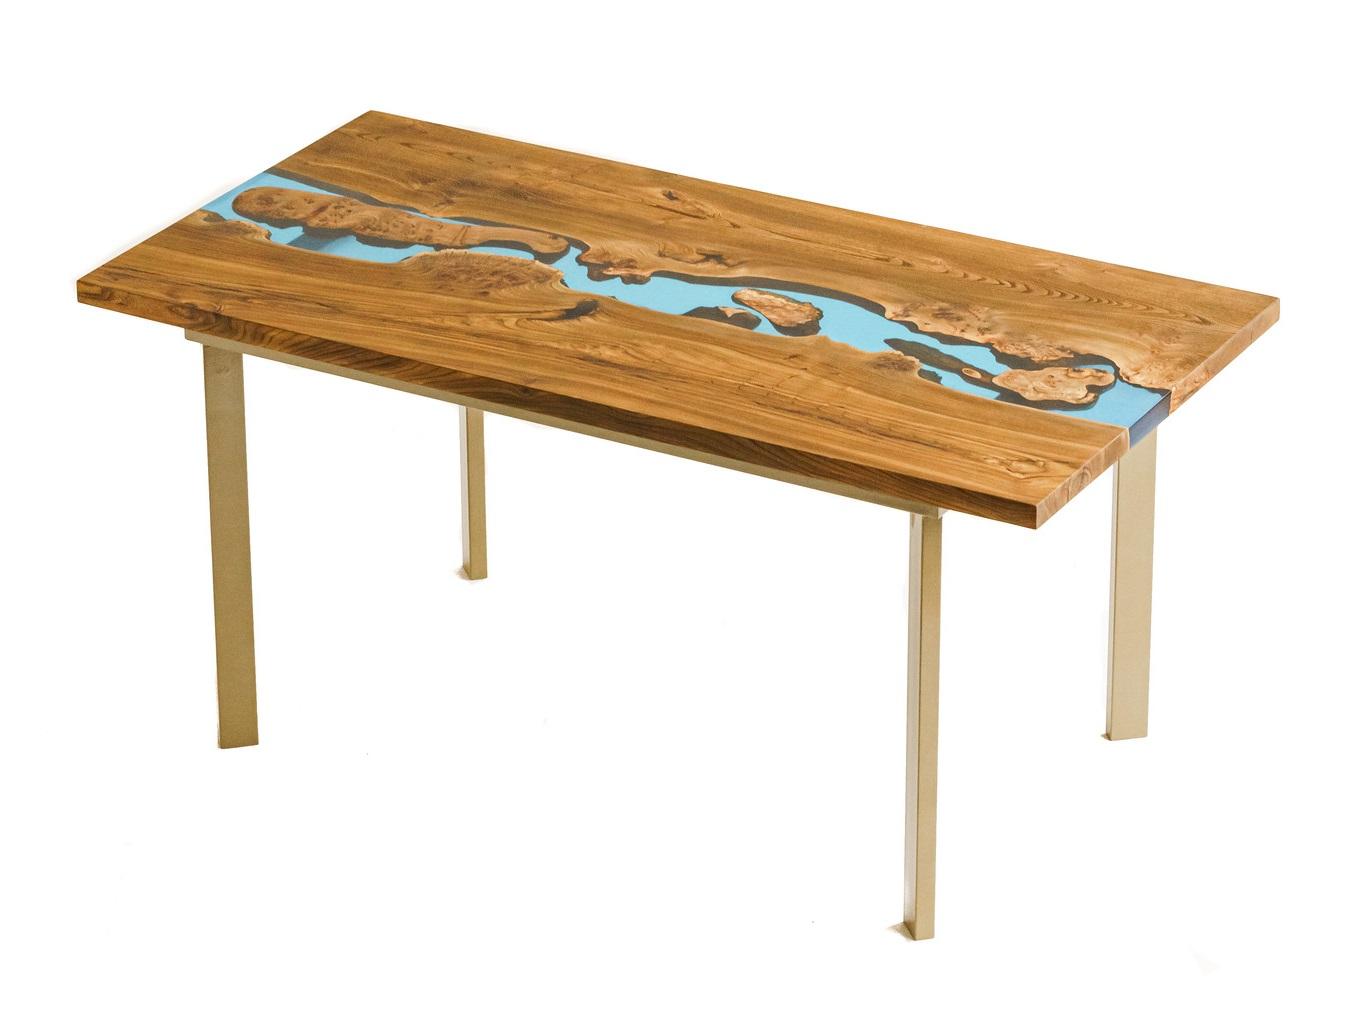 Обеденный стол (woodzpro) коричневый 80x75x160 см.